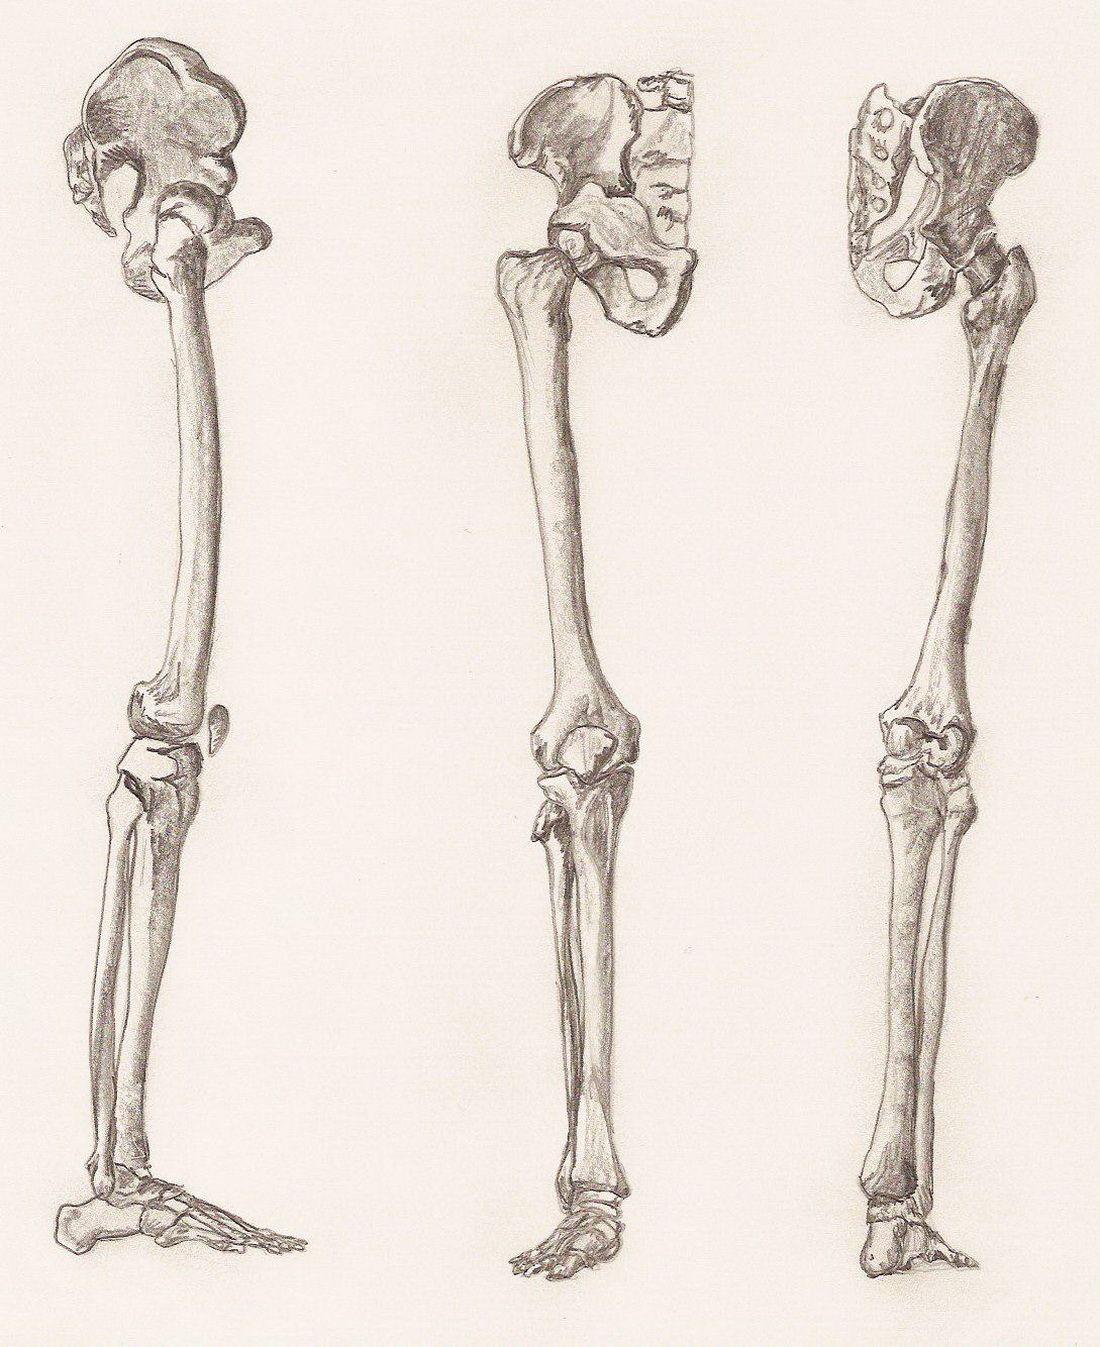 Human Leg Bone Anatomy Estudos Ee Pinterest Human Leg And Anatomy